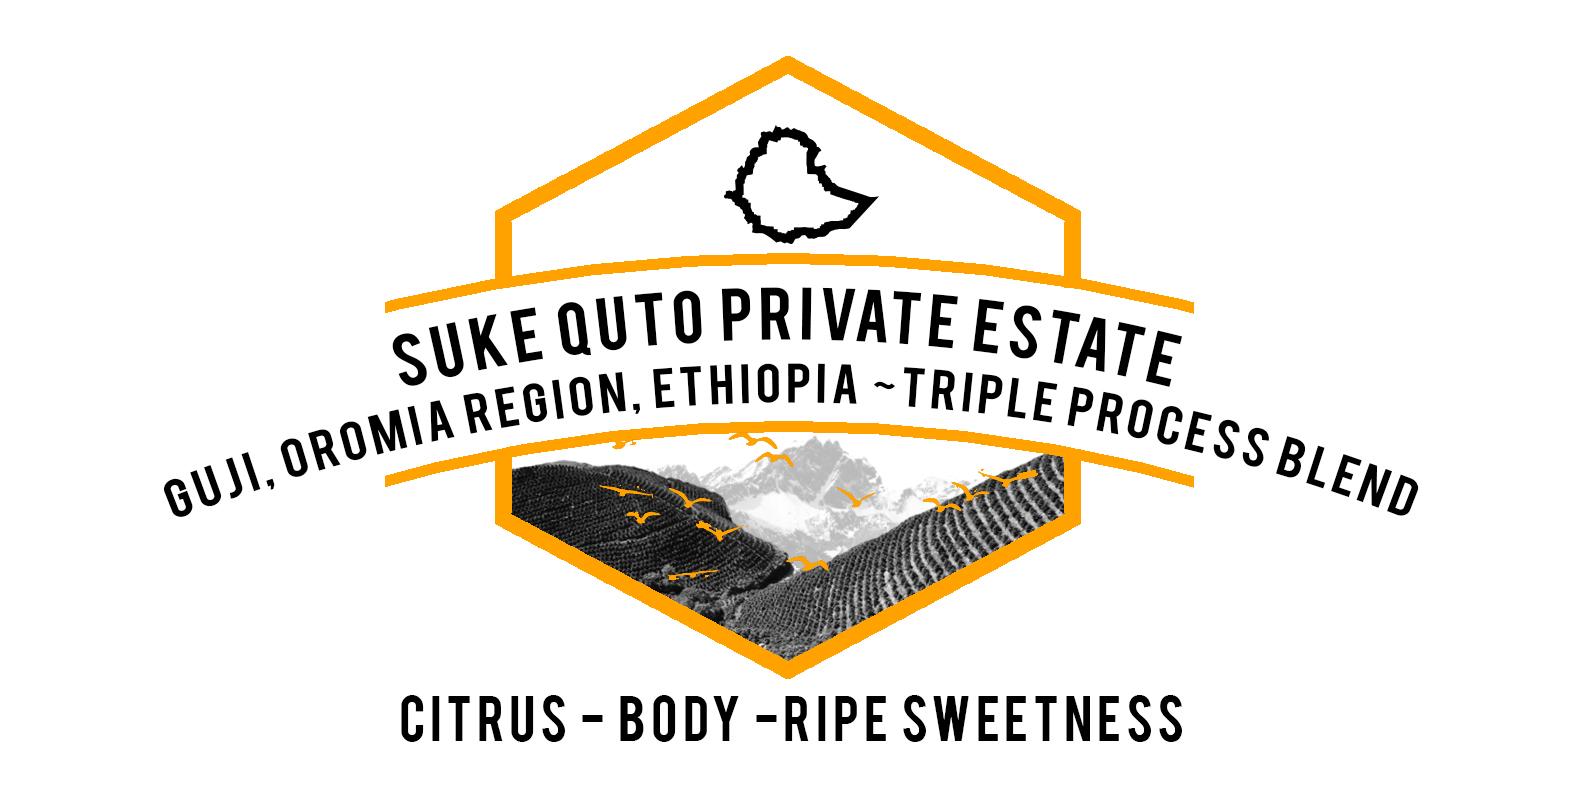 ETHIOPIAN SUKE QUTO TRIPLE PROCESS BLEND